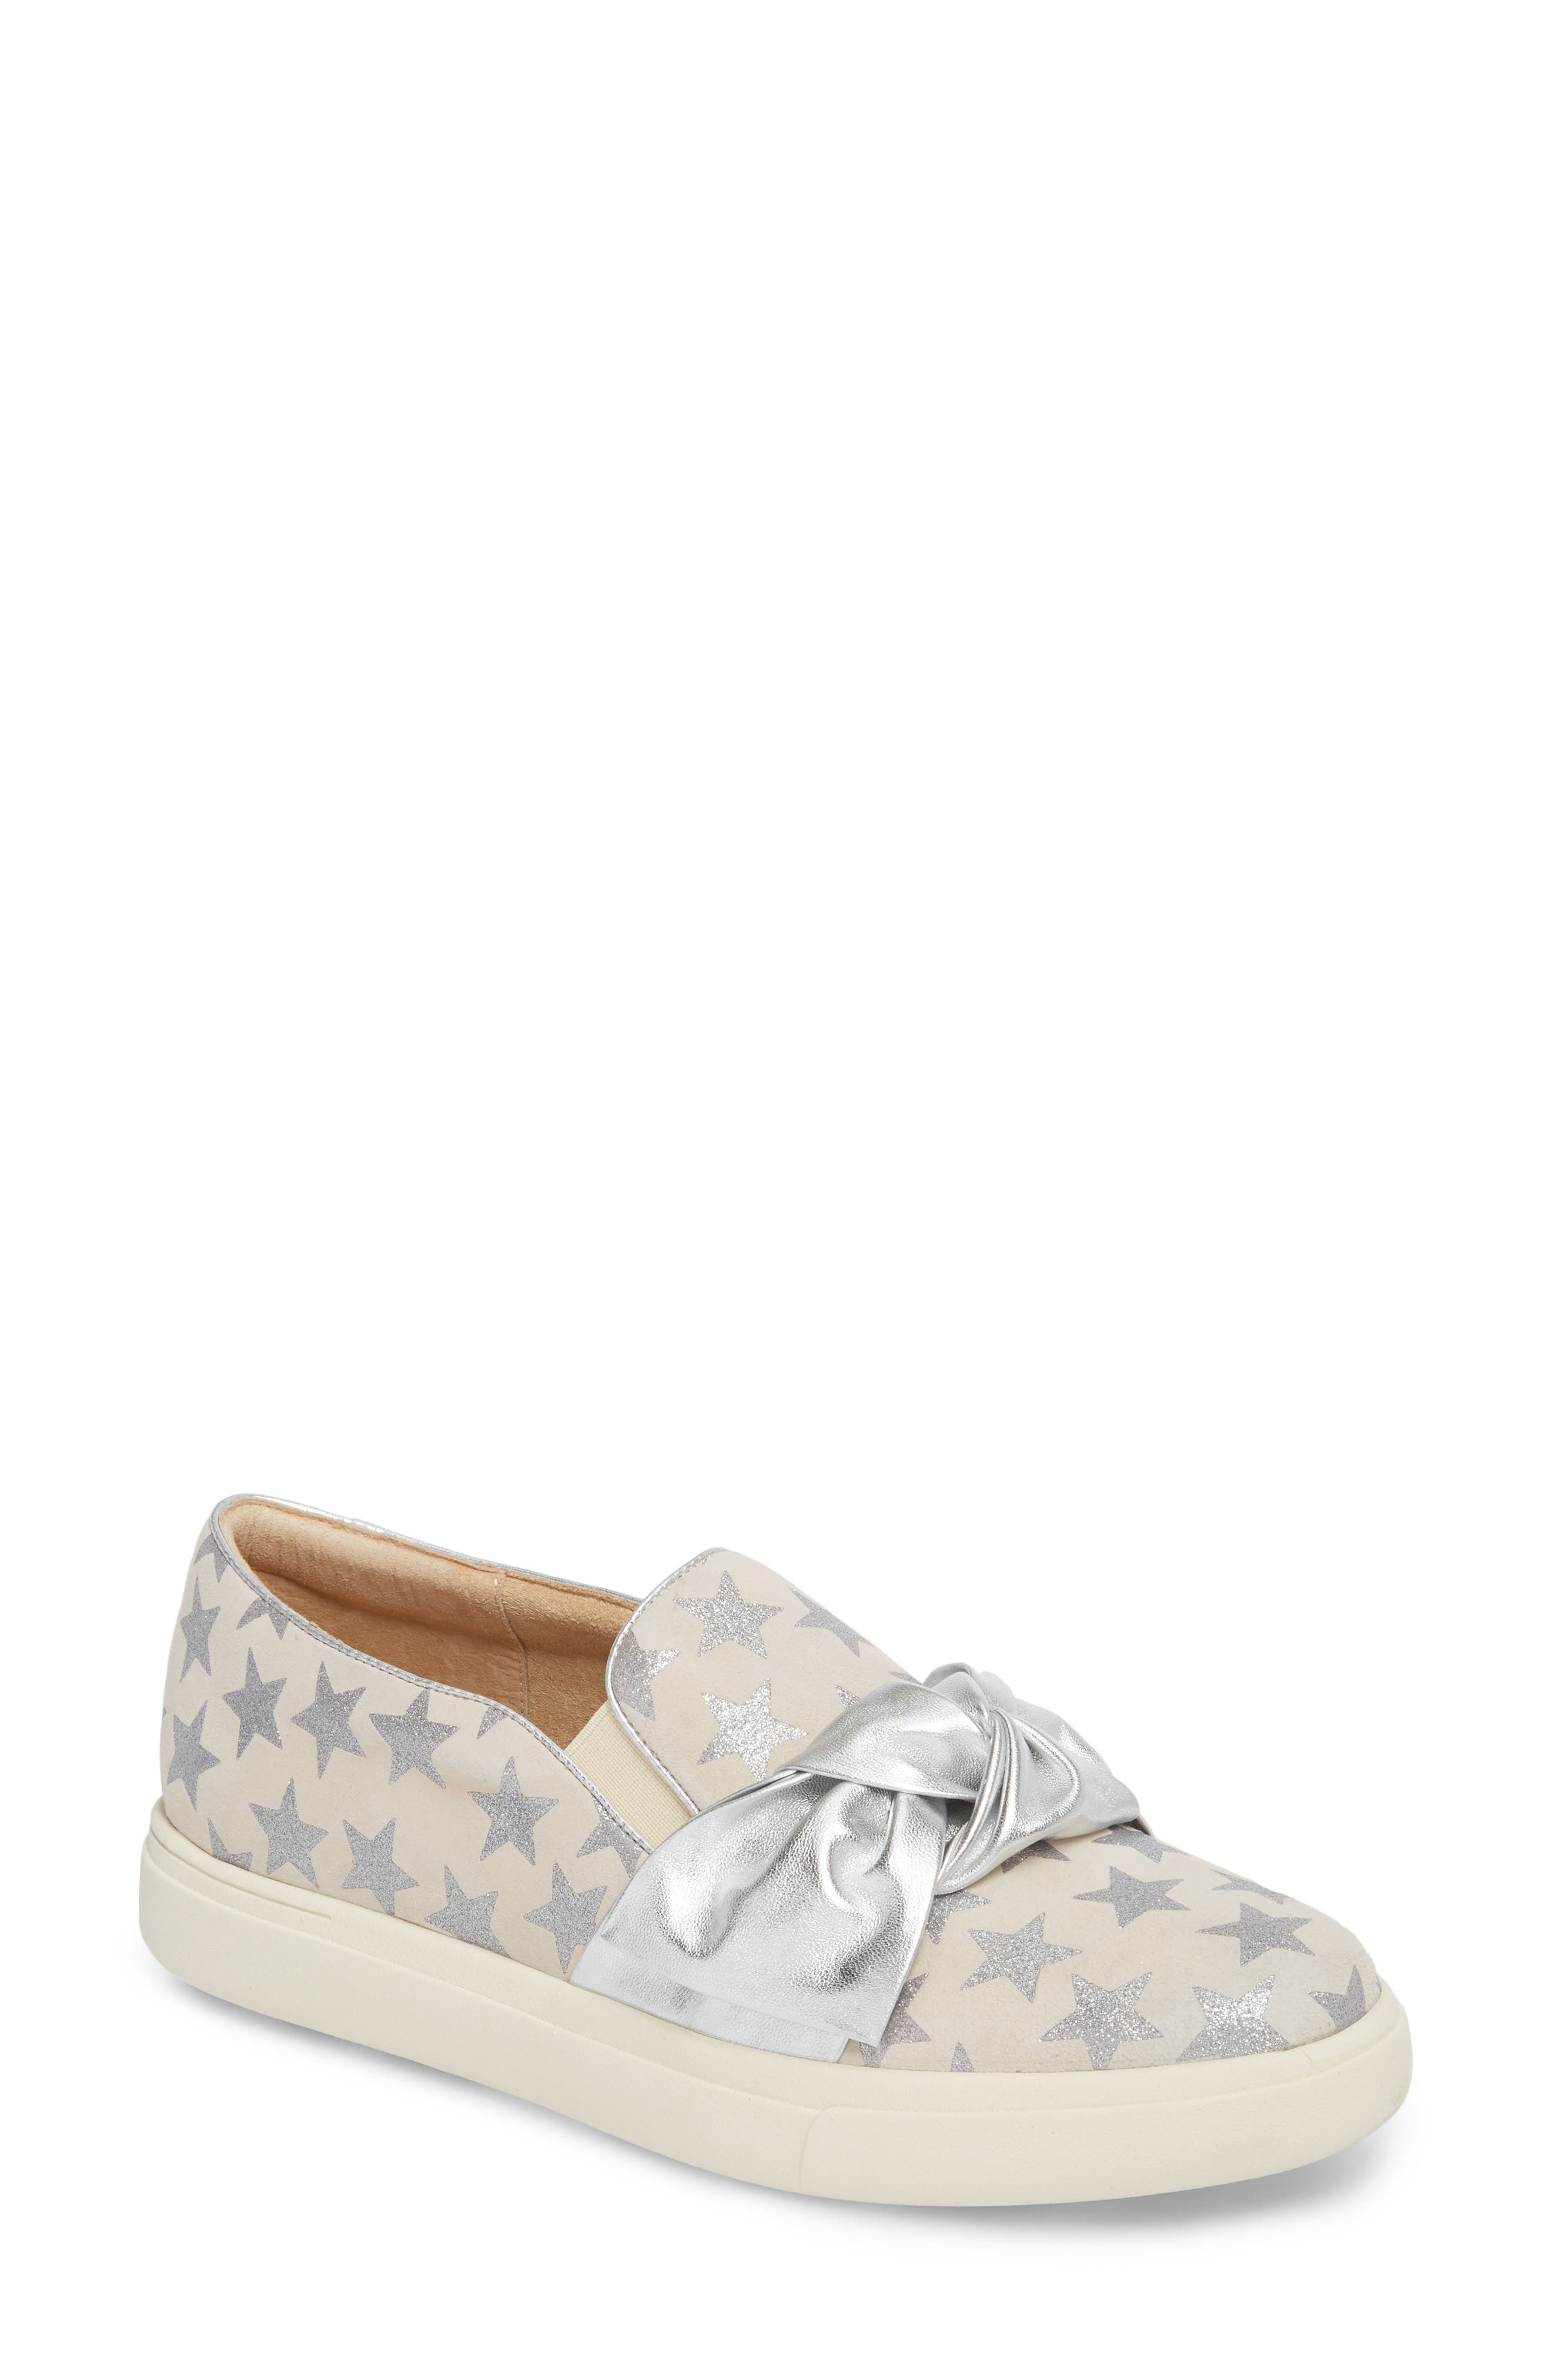 Odelet Slip-On Sneaker,                         Main,                         color, Beige/ Silver Suede